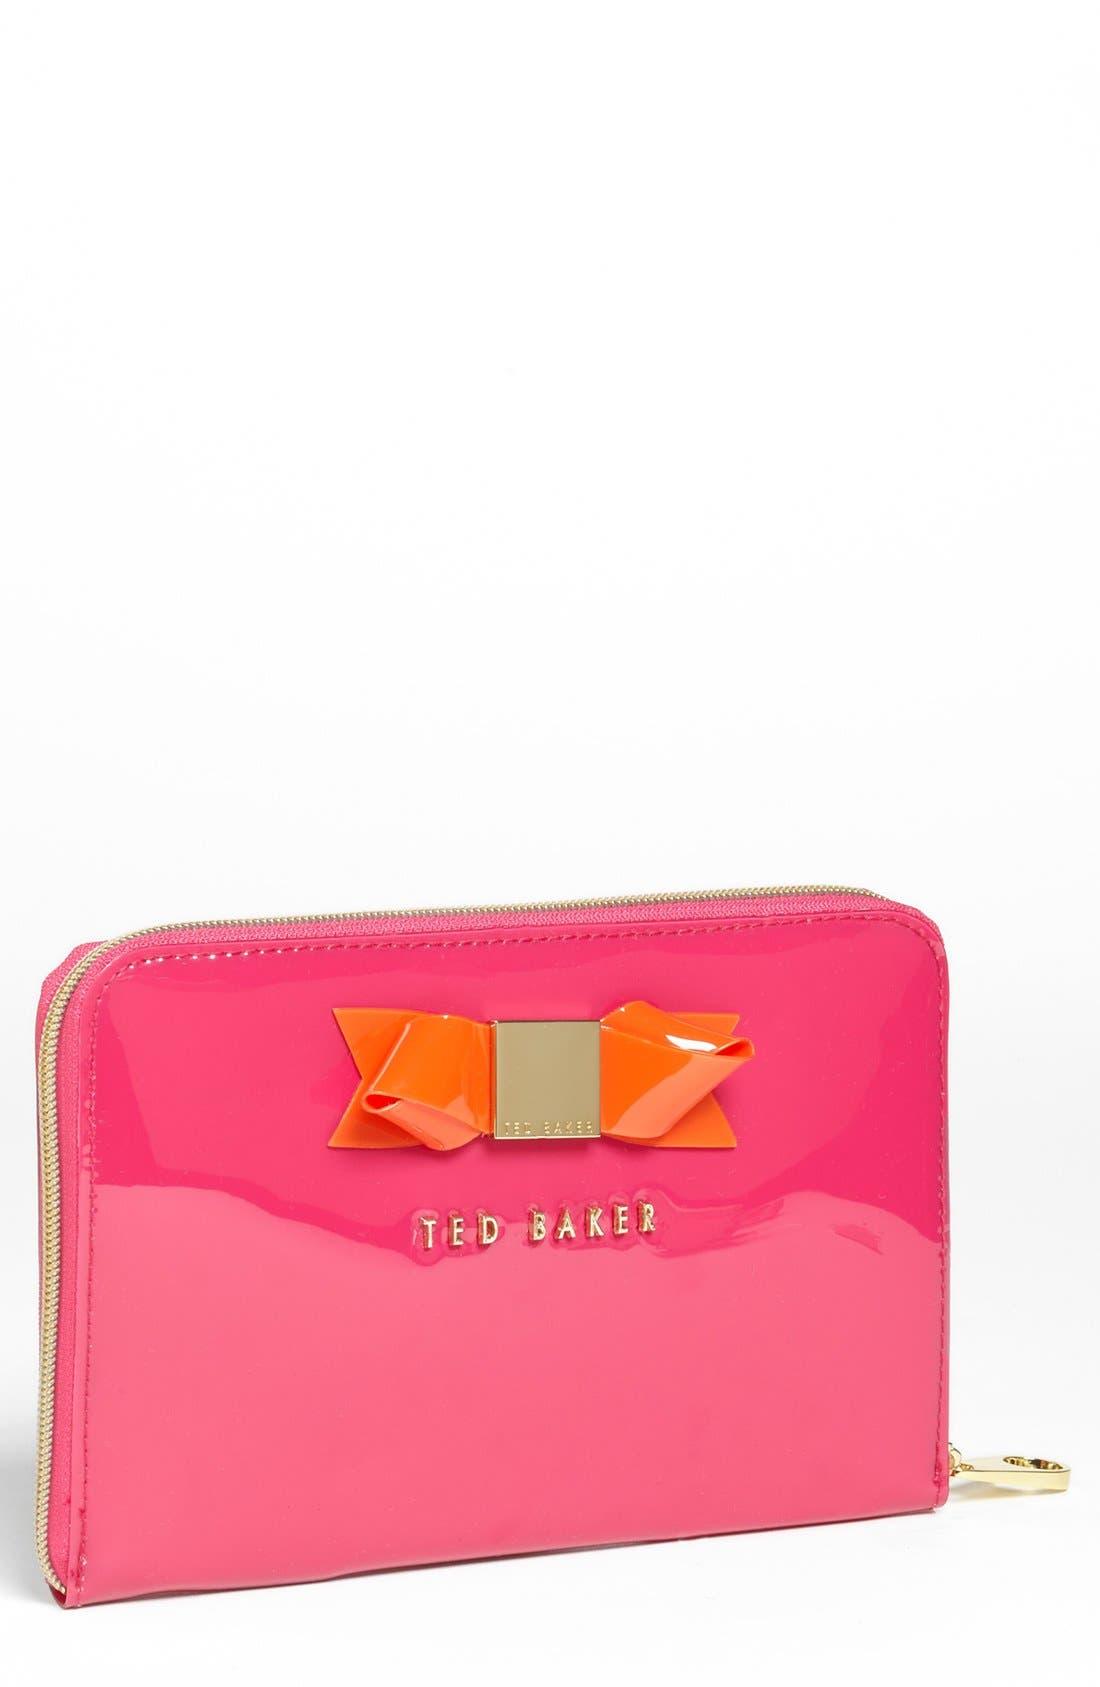 Main Image - Ted Baker London iPad mini™ Tablet Case